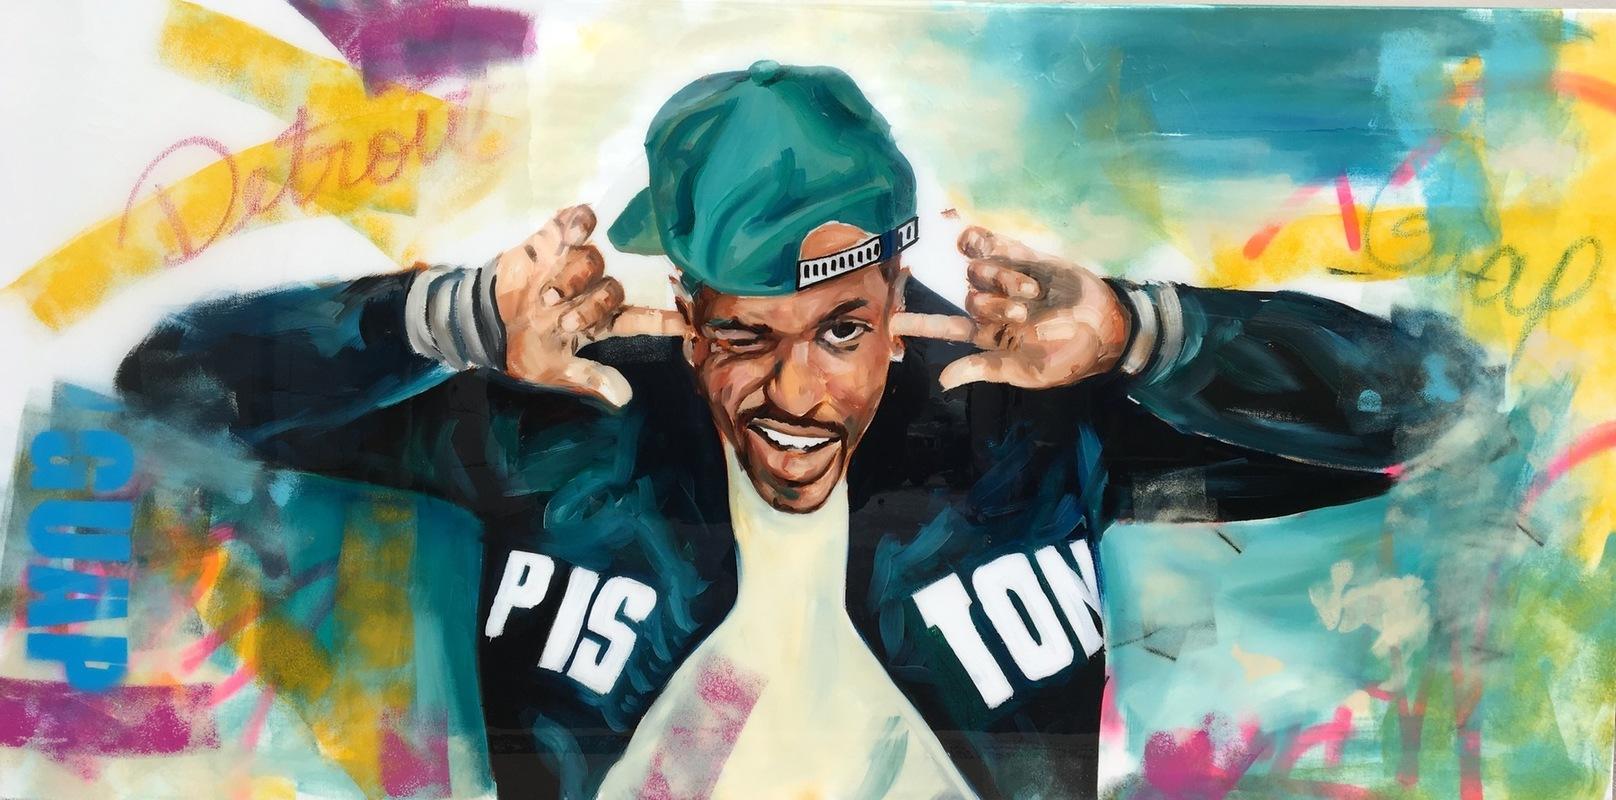 Desiree Kelly Art - Detroit based artist - Big Sean (Sold)